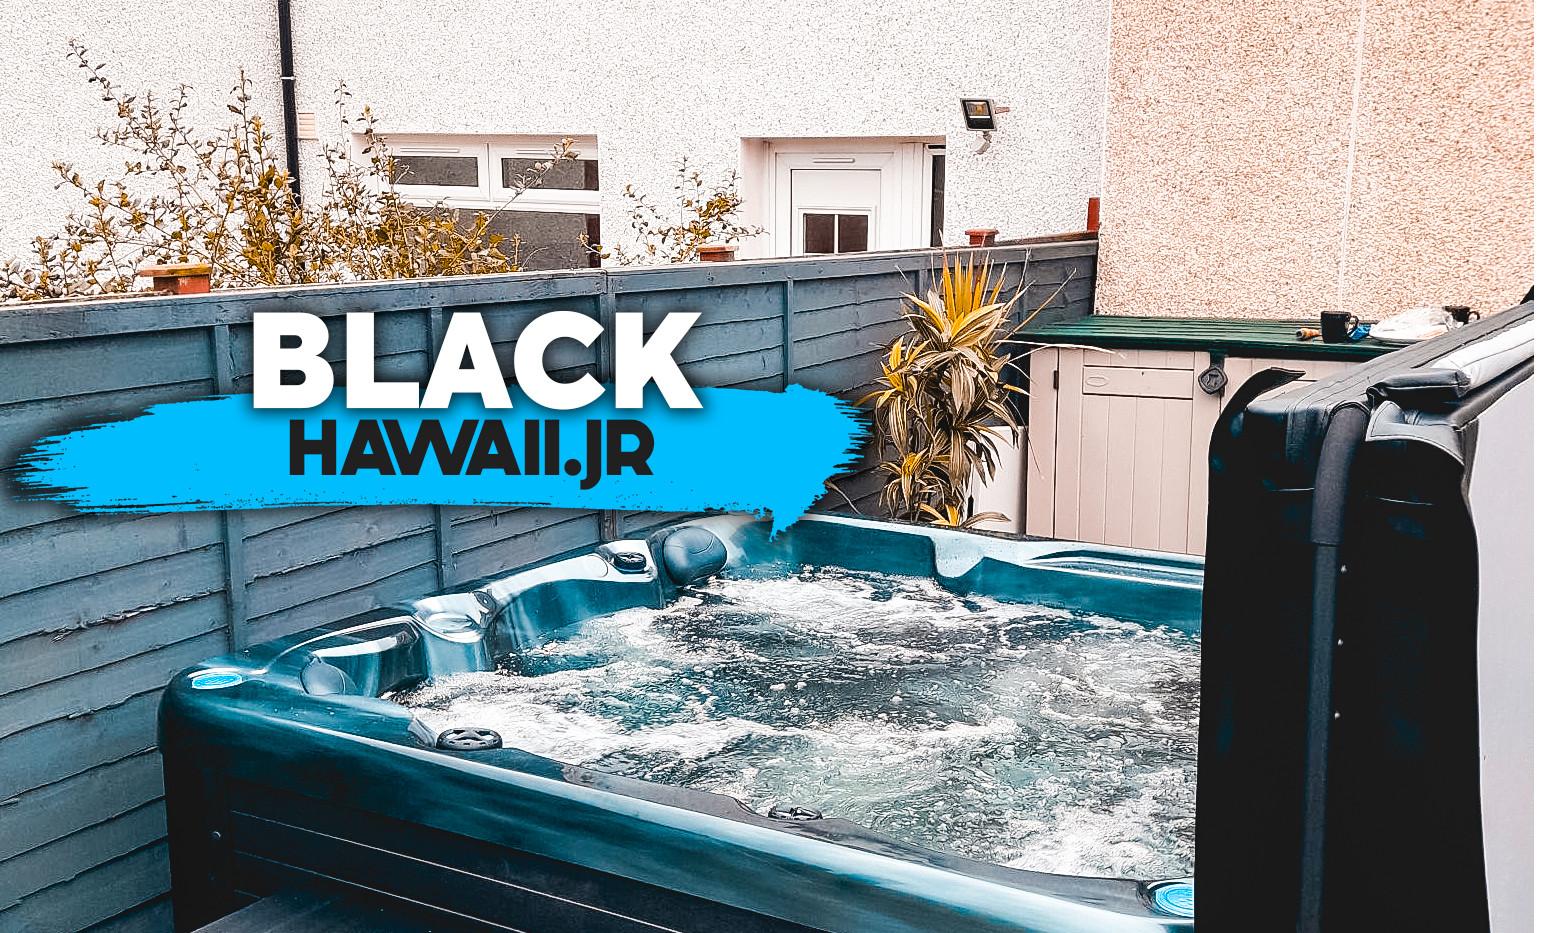 Hawaii.Jr_PreviousInstall_BLACK.jpg